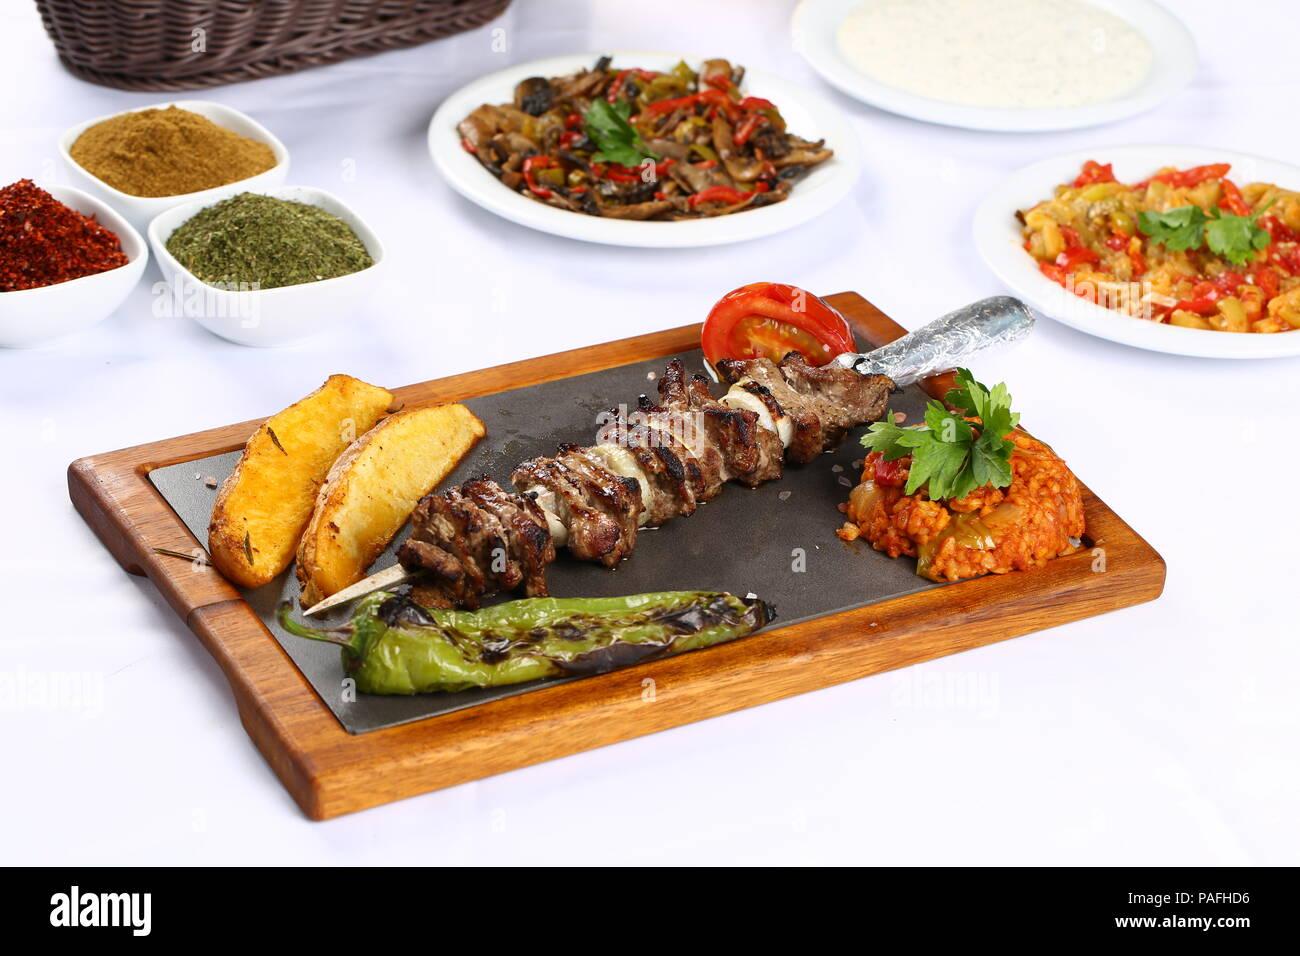 https www alamy com turkish cag kebab doner in plate image213013954 html